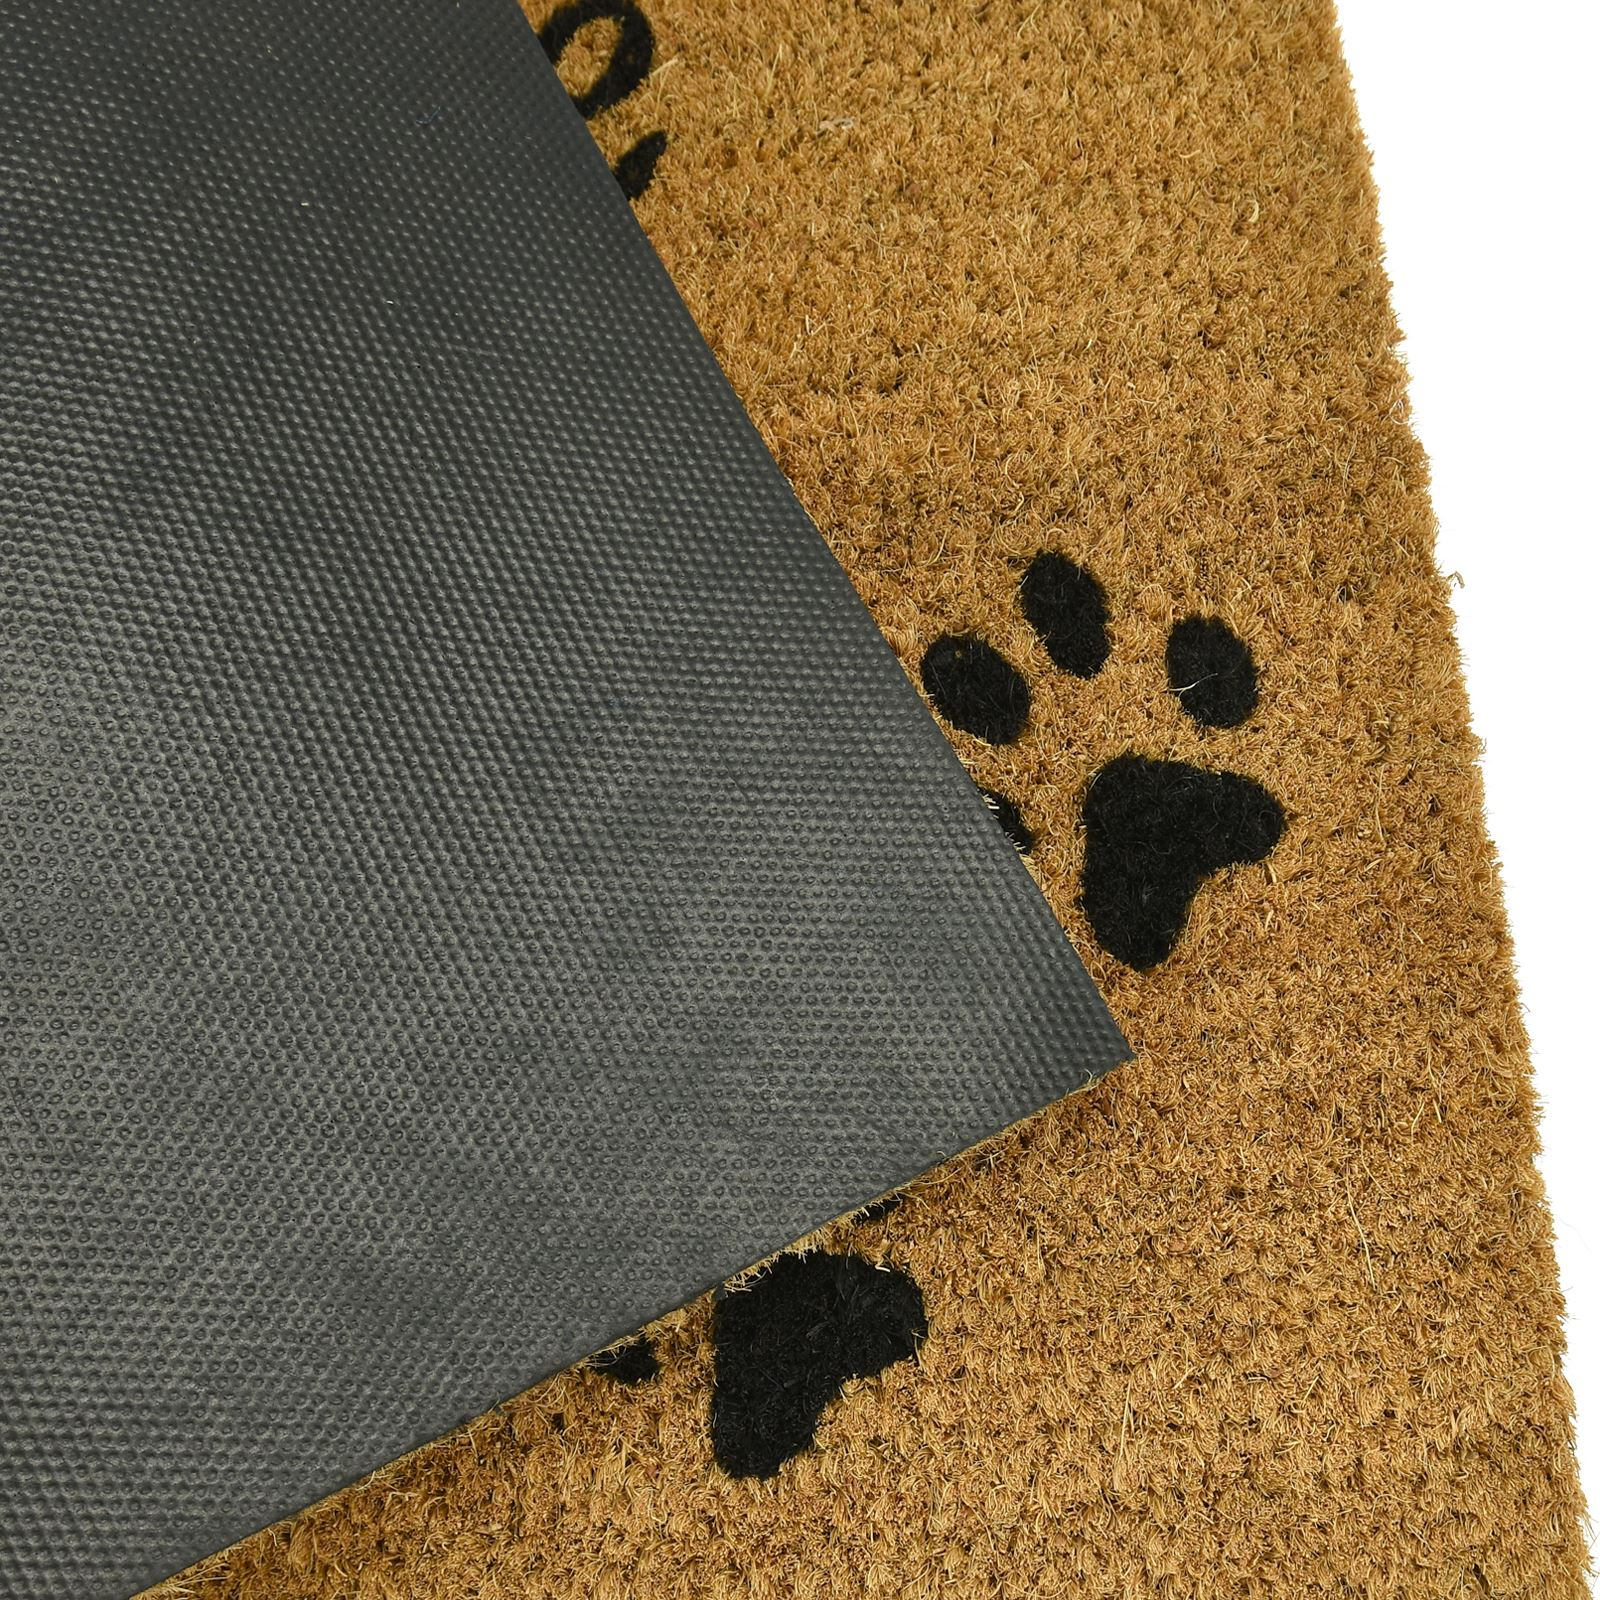 Plain-Non-Slip-Door-Mat-Tough-Natural-Coir-PVC-Back-Welcome-Doormat-40-x-60cm miniatura 102